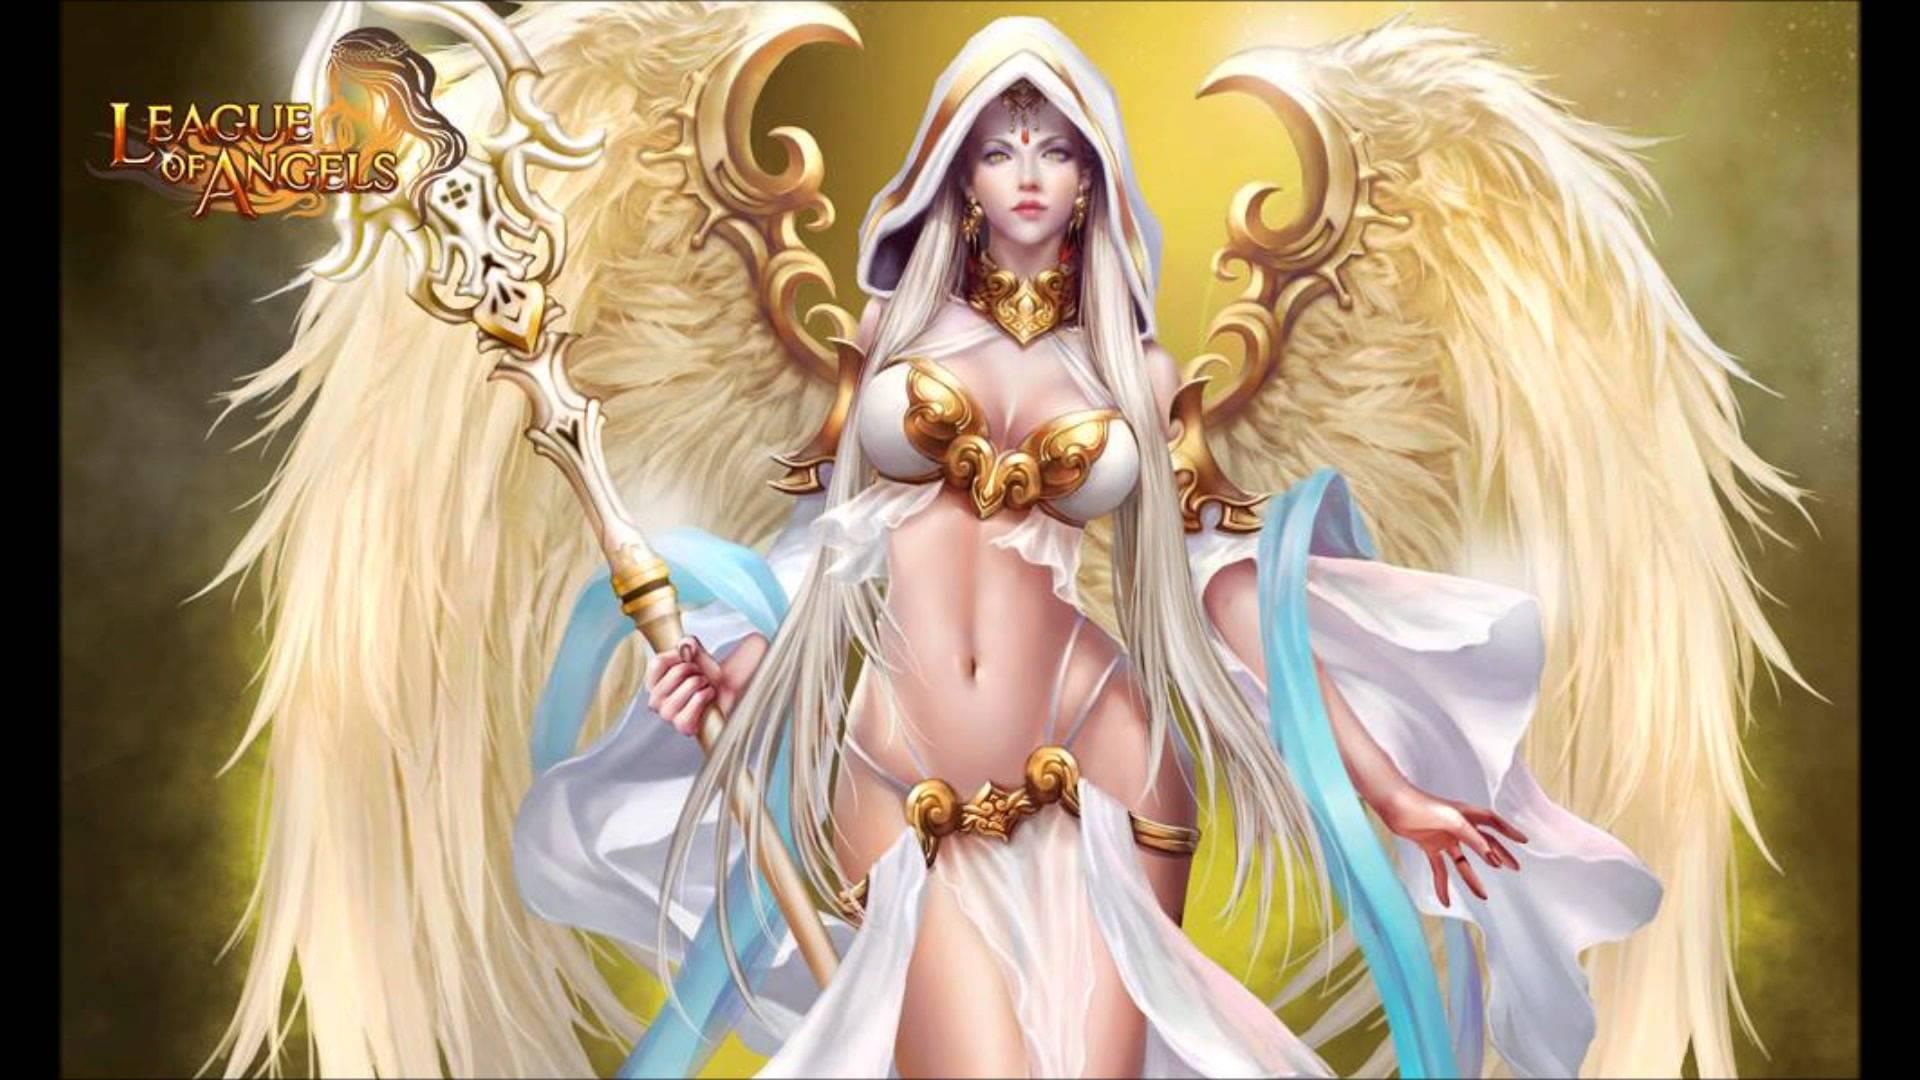 Boadicea War Angel By League Of Angels Angels Mystic Lands